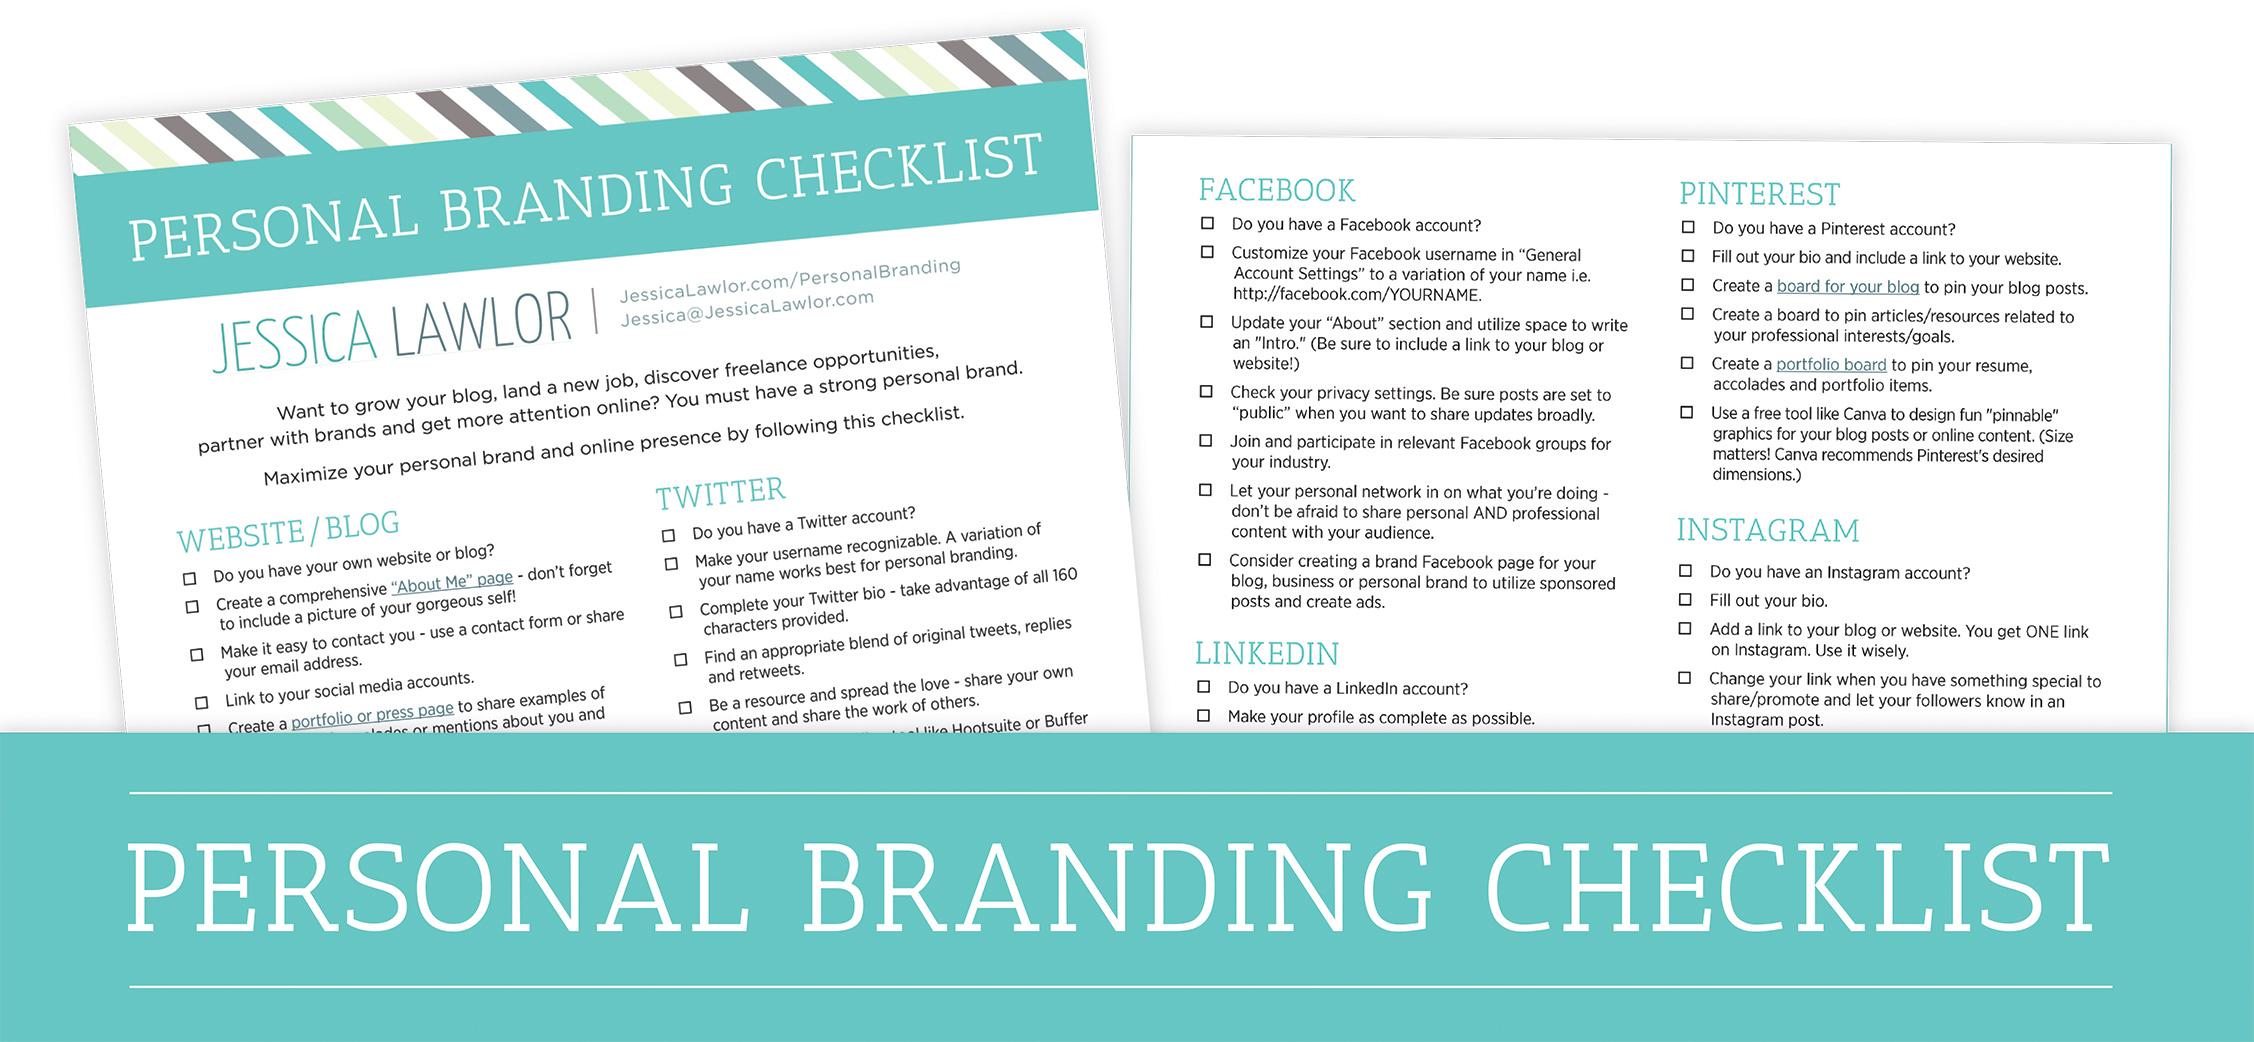 personal branding checklist- Jessica Lawlor